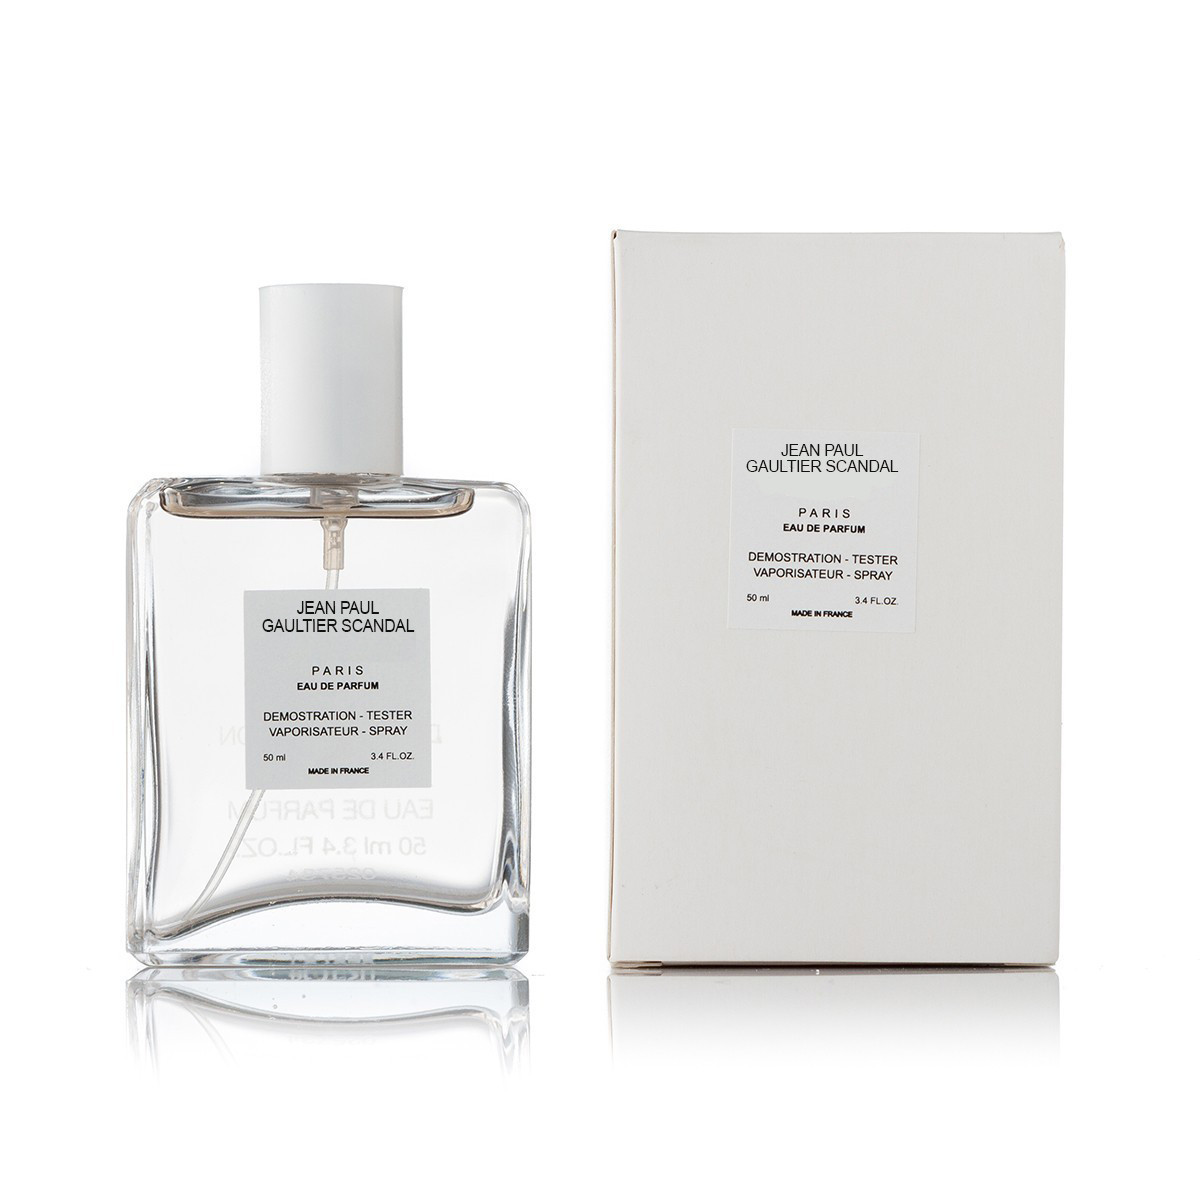 Jean Paul Gaultier Scandal - White Tester 50ml